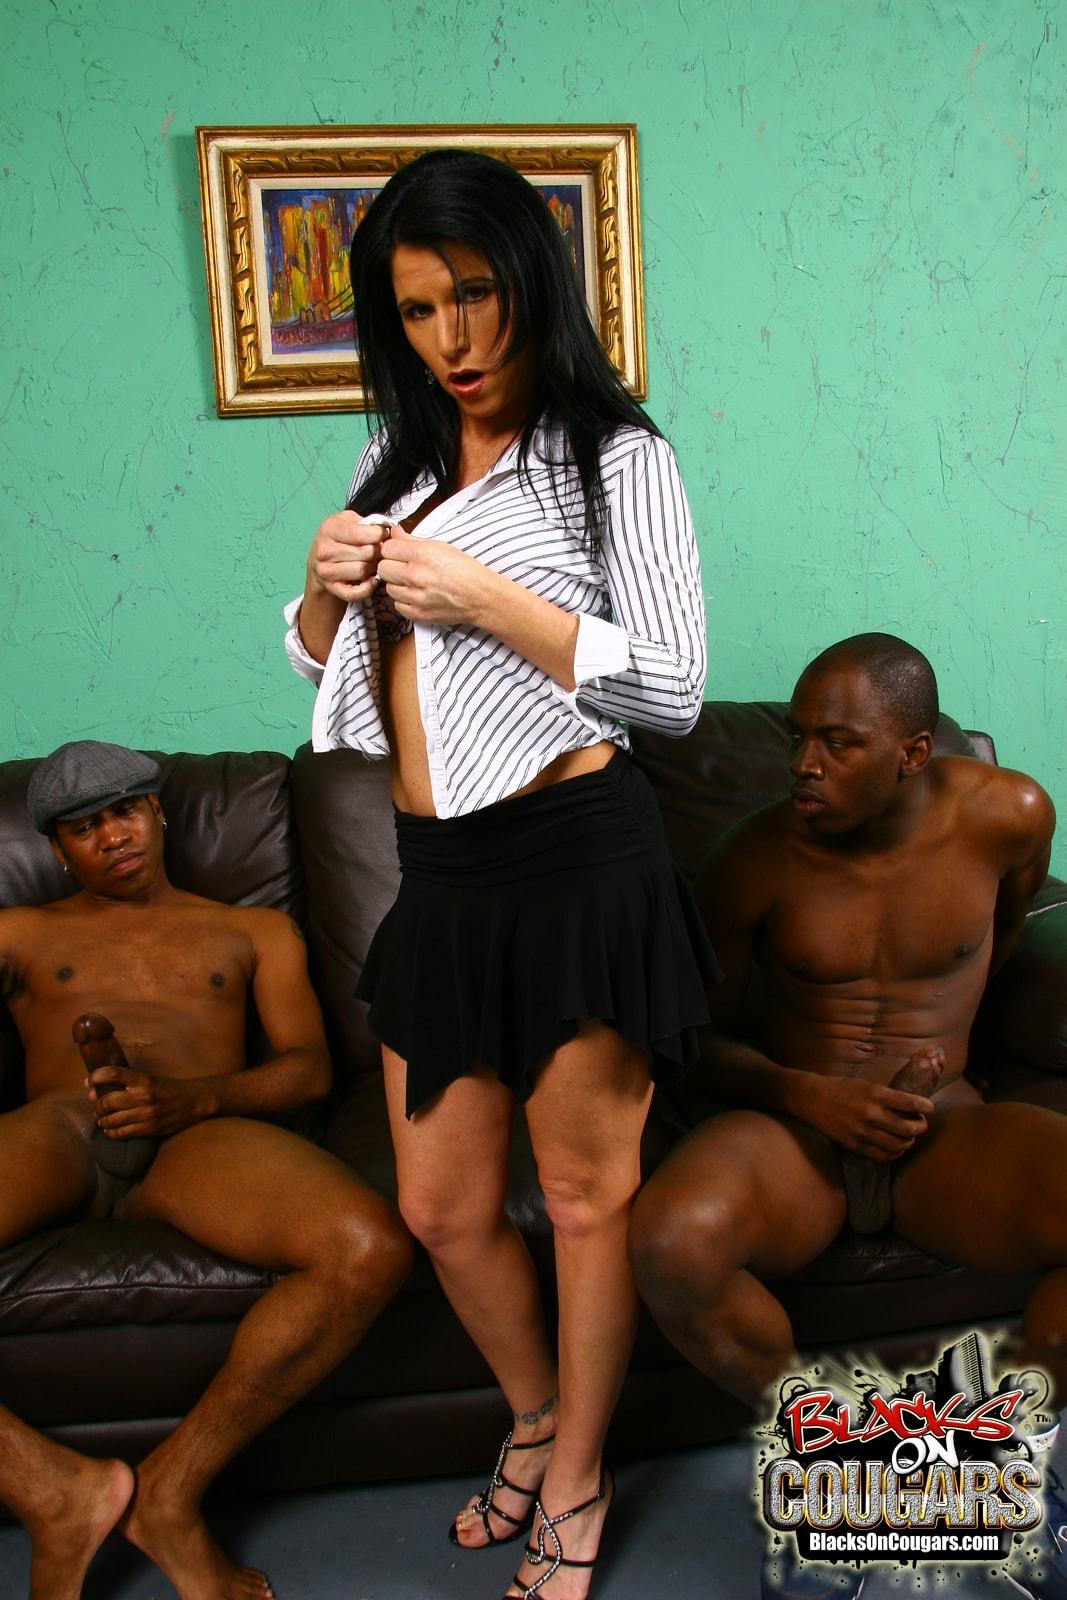 Dogfart '- Blacks On Cougars' starring Kendra Secrets (Photo 11)